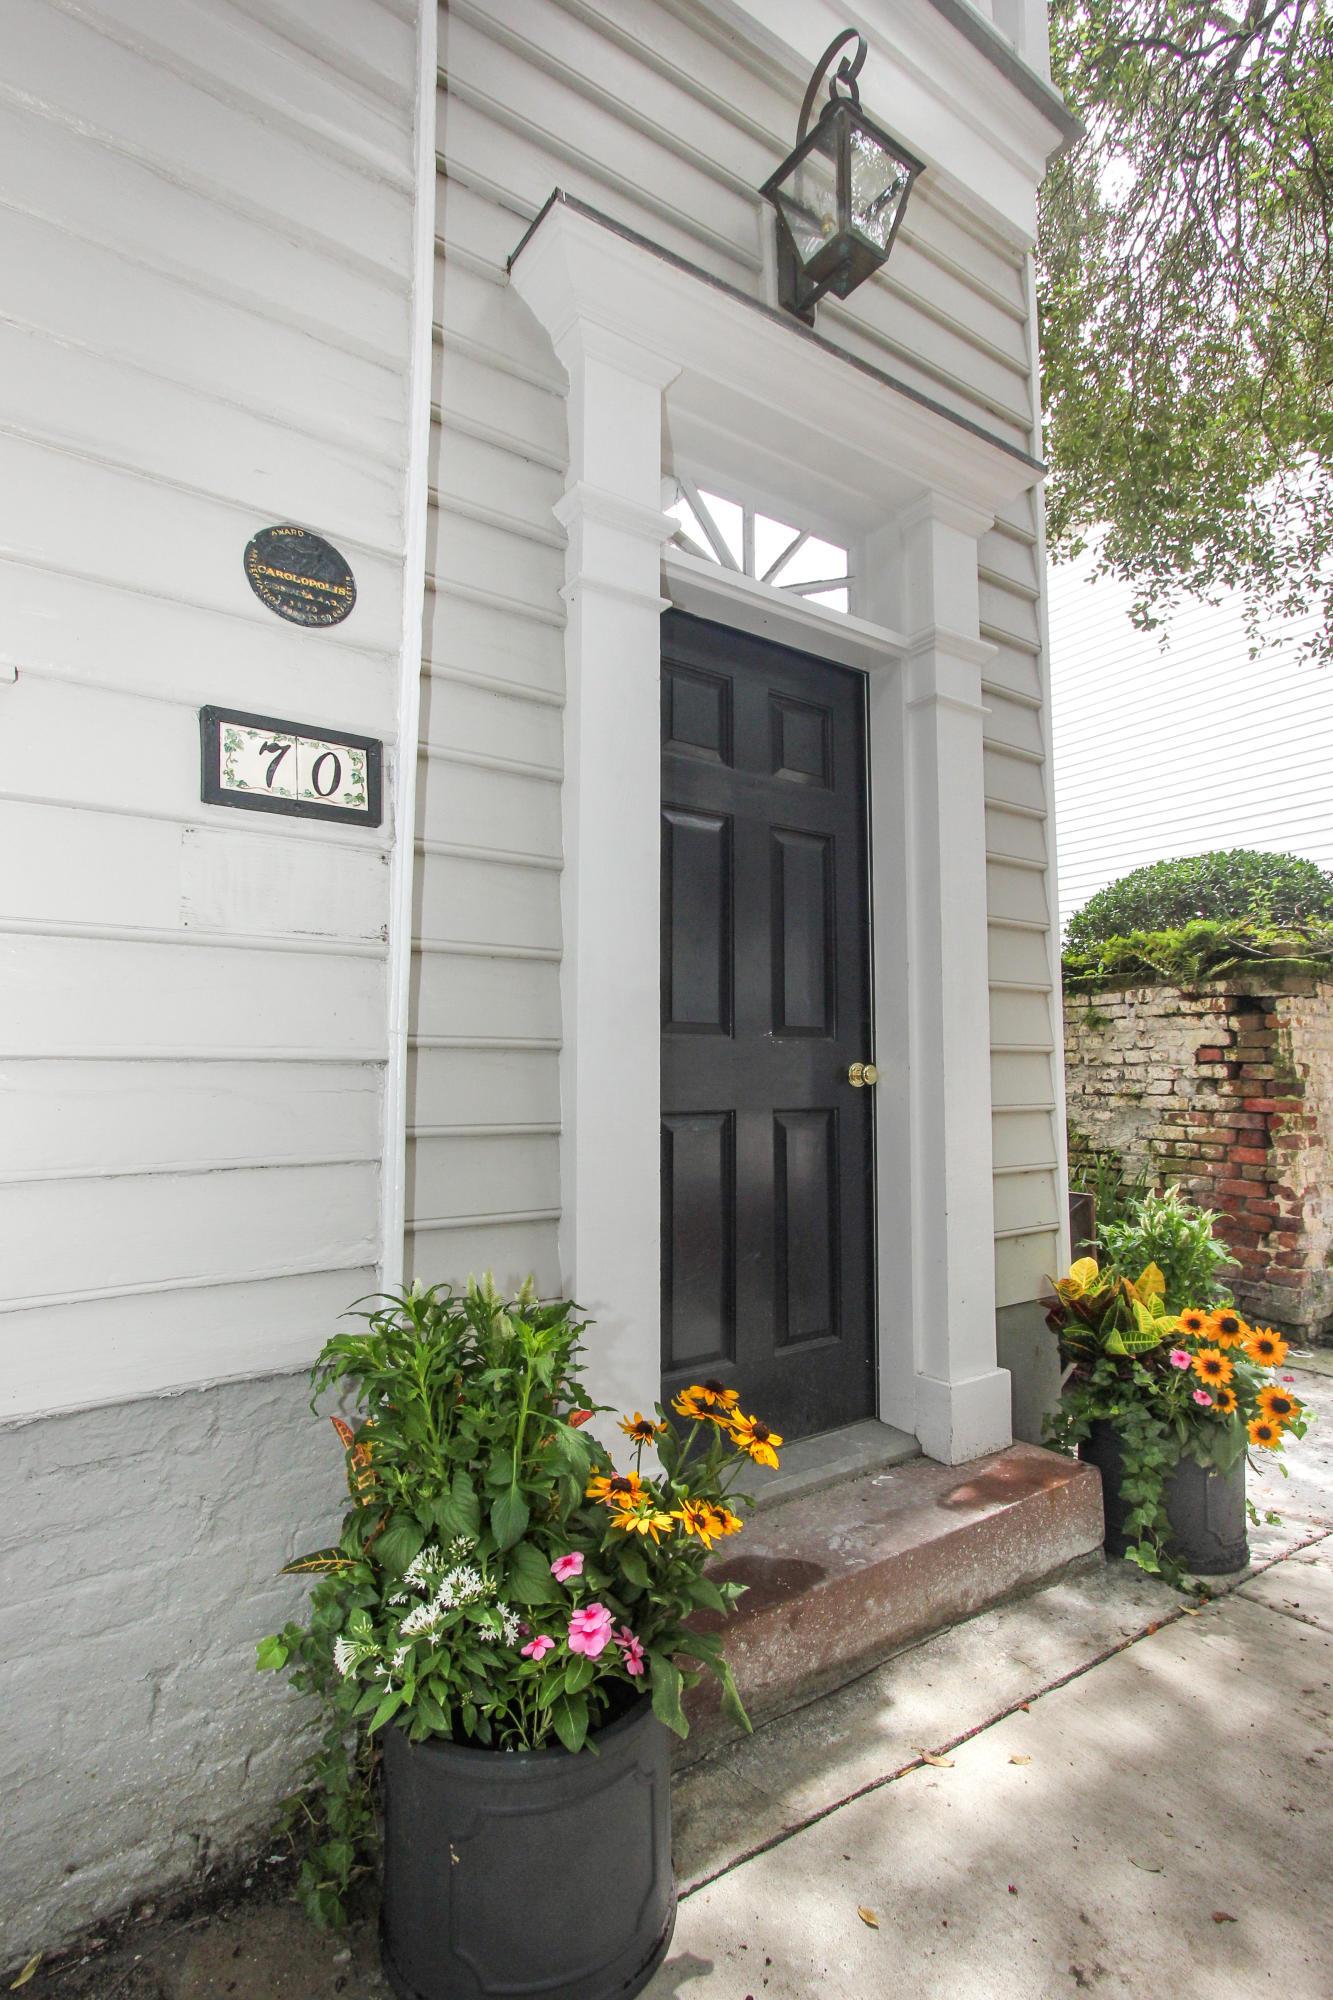 Photo of 70 Church St, Charleston, SC 29401